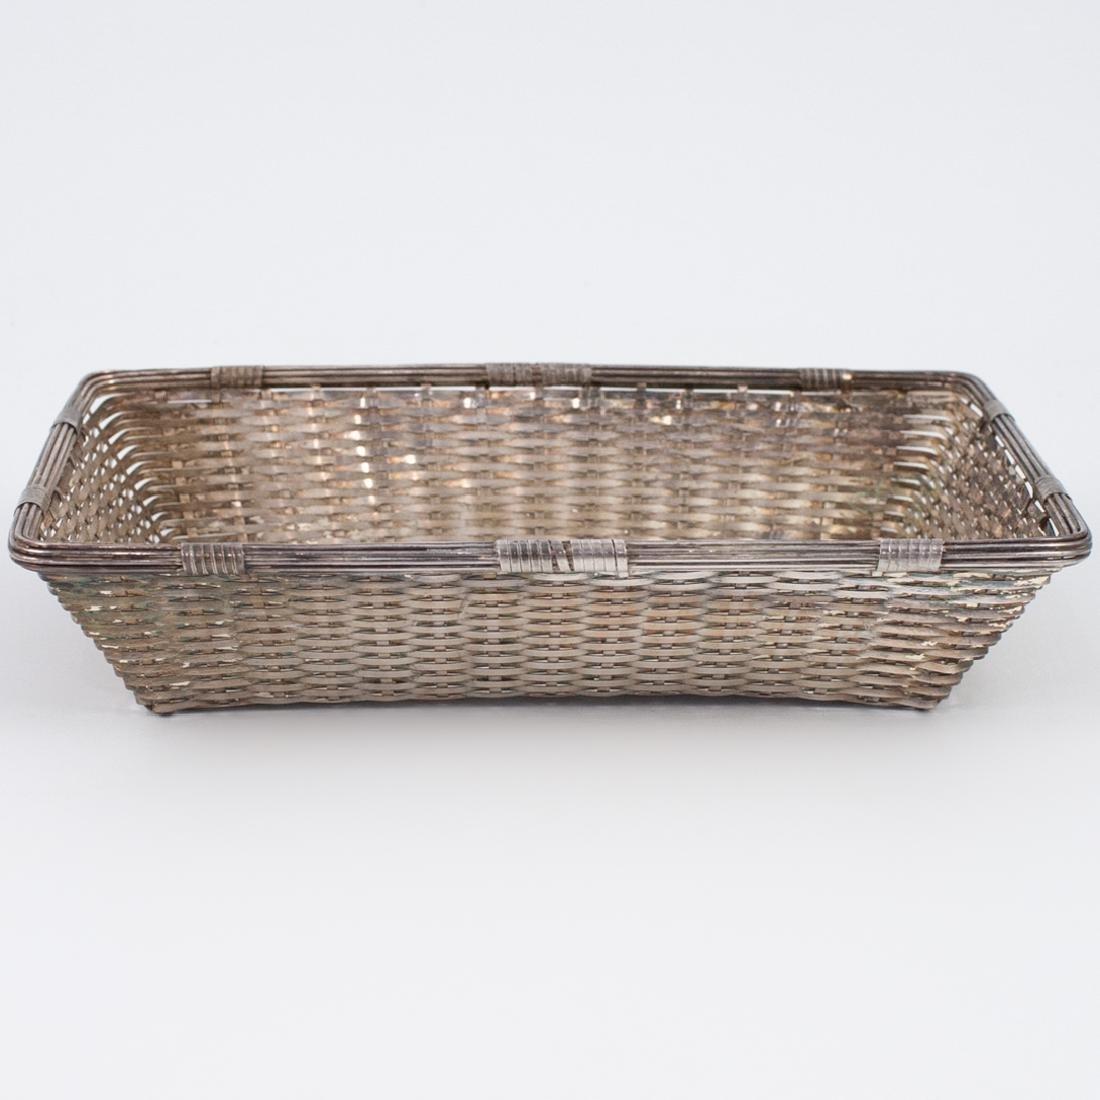 Christofle Silver-Plated Basket - 2